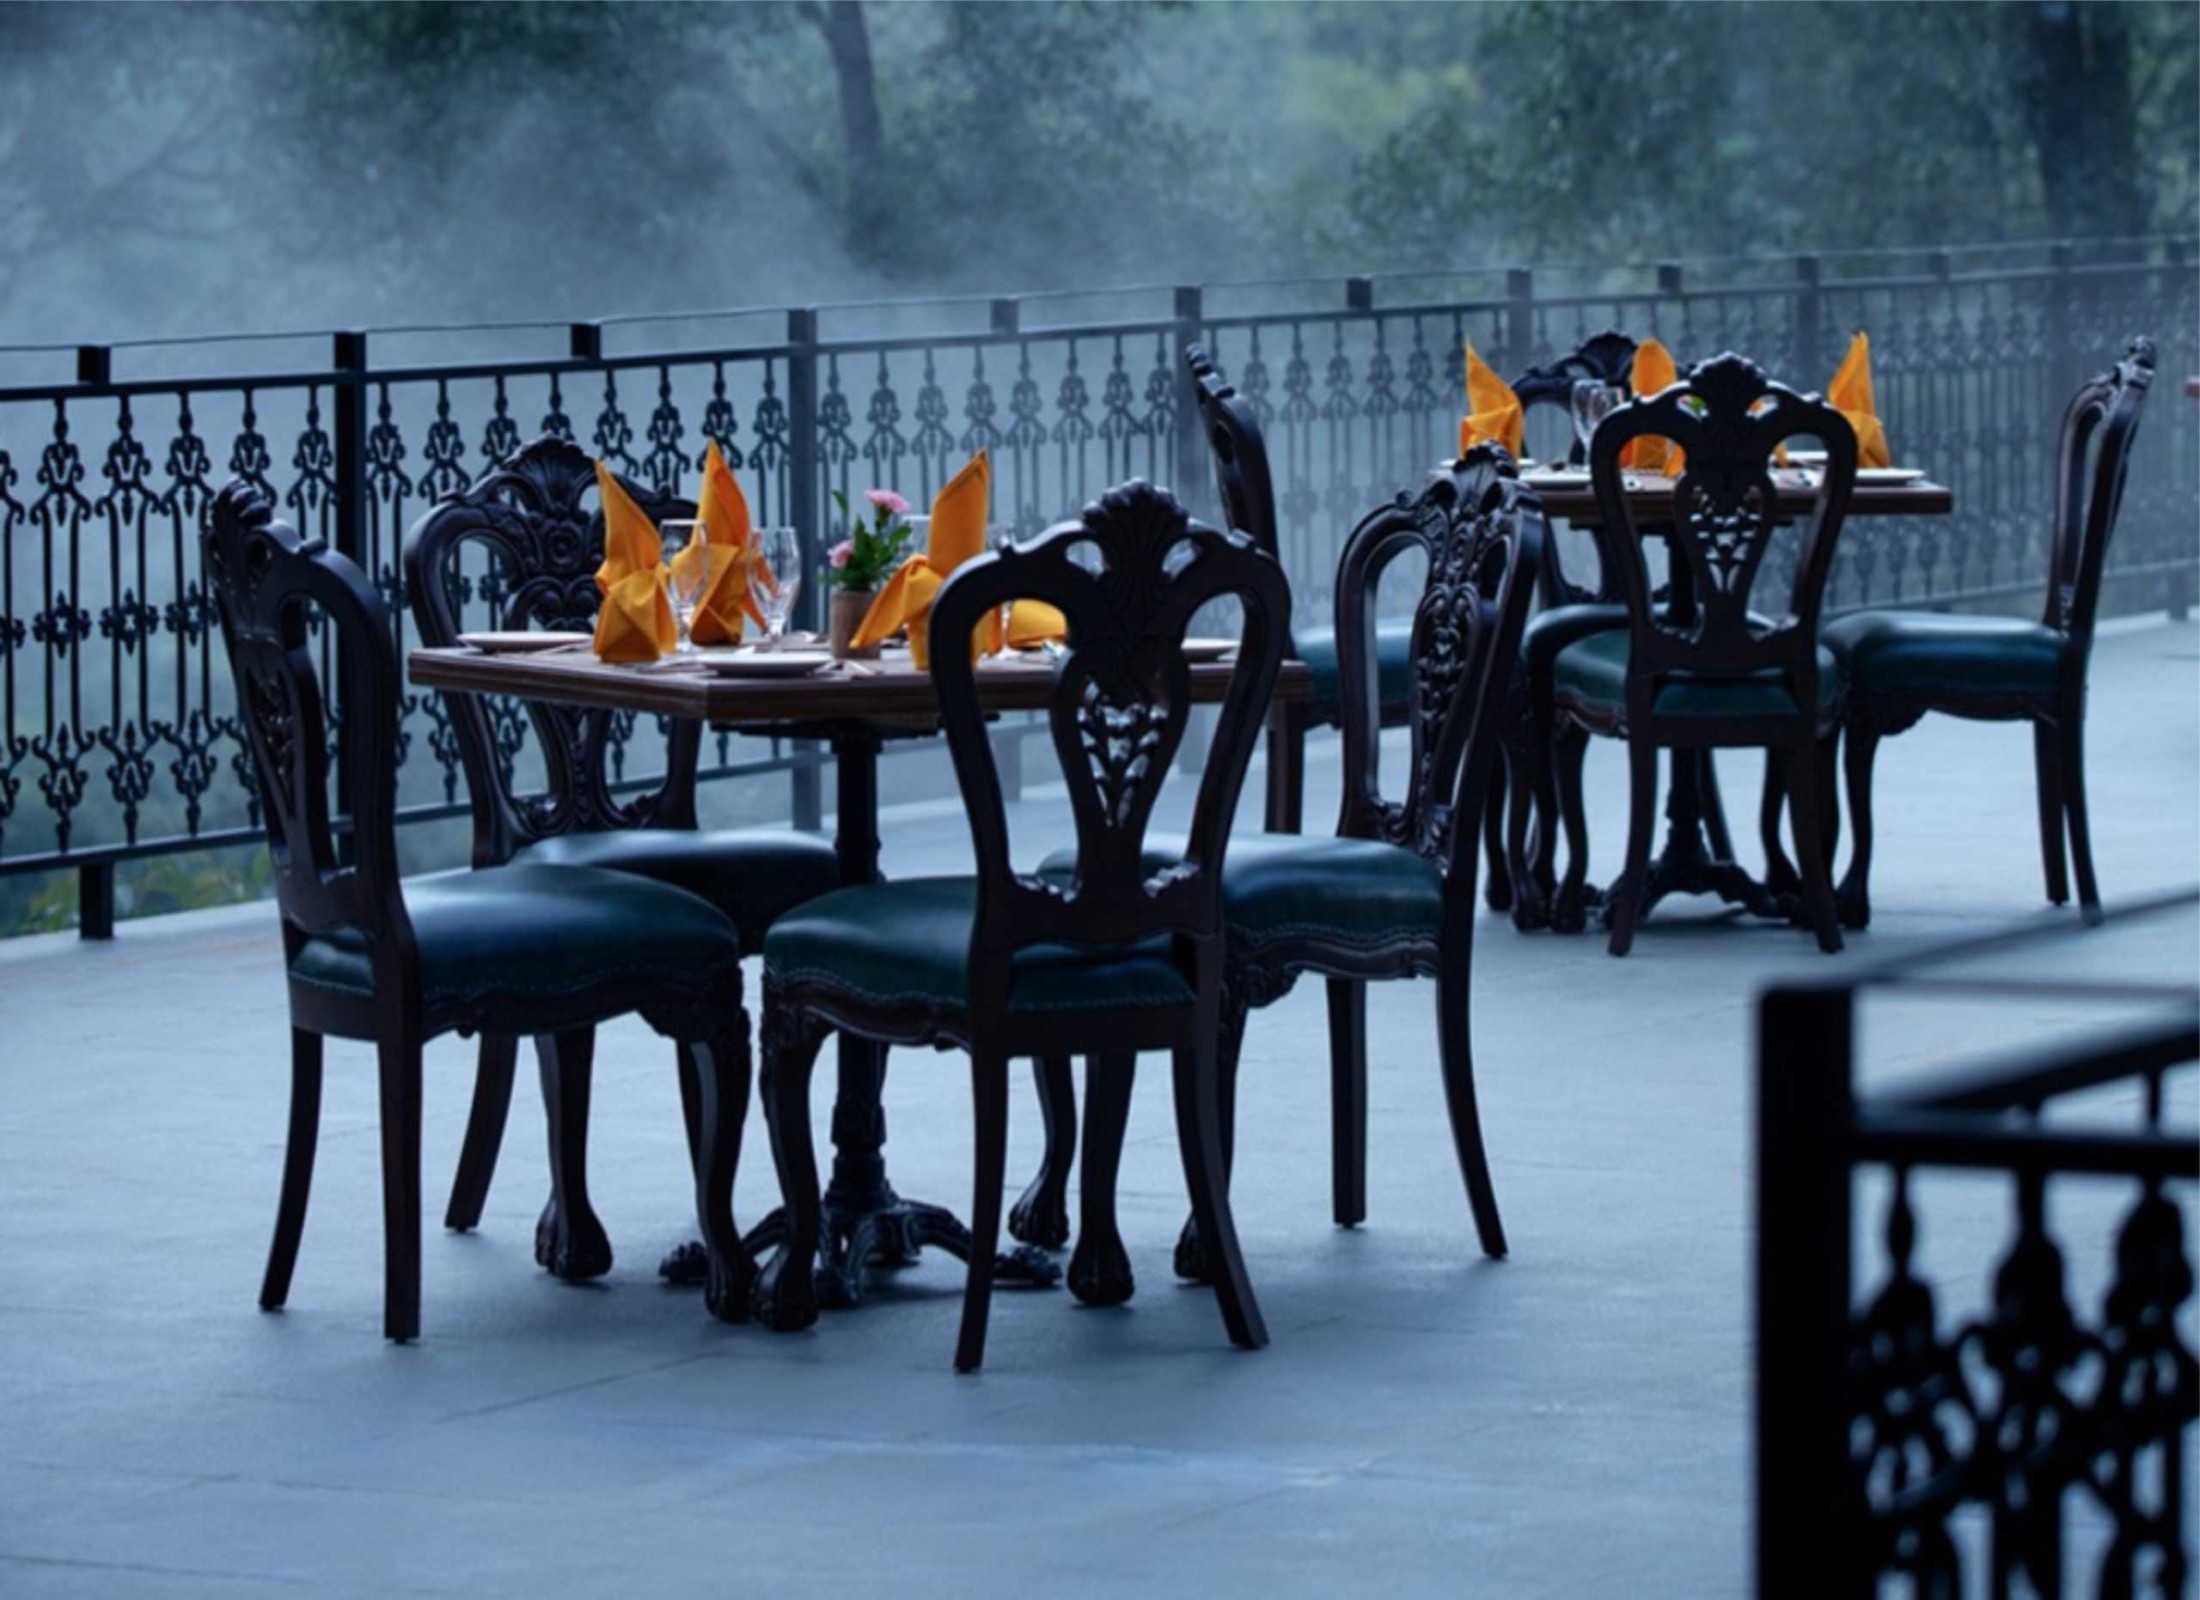 Rekai Design Interior Coorg Wilderness Resort, Coorg-India Virajpet, Main, Mysore - Madikeri Rd, Madikeri, Karnataka 571201, India Virajpet, Main, Mysore - Madikeri Rd, Madikeri, Karnataka 571201, India Rekai-Design-Interior-Coorg-Wilderness-Resort-Coorg-India  113300